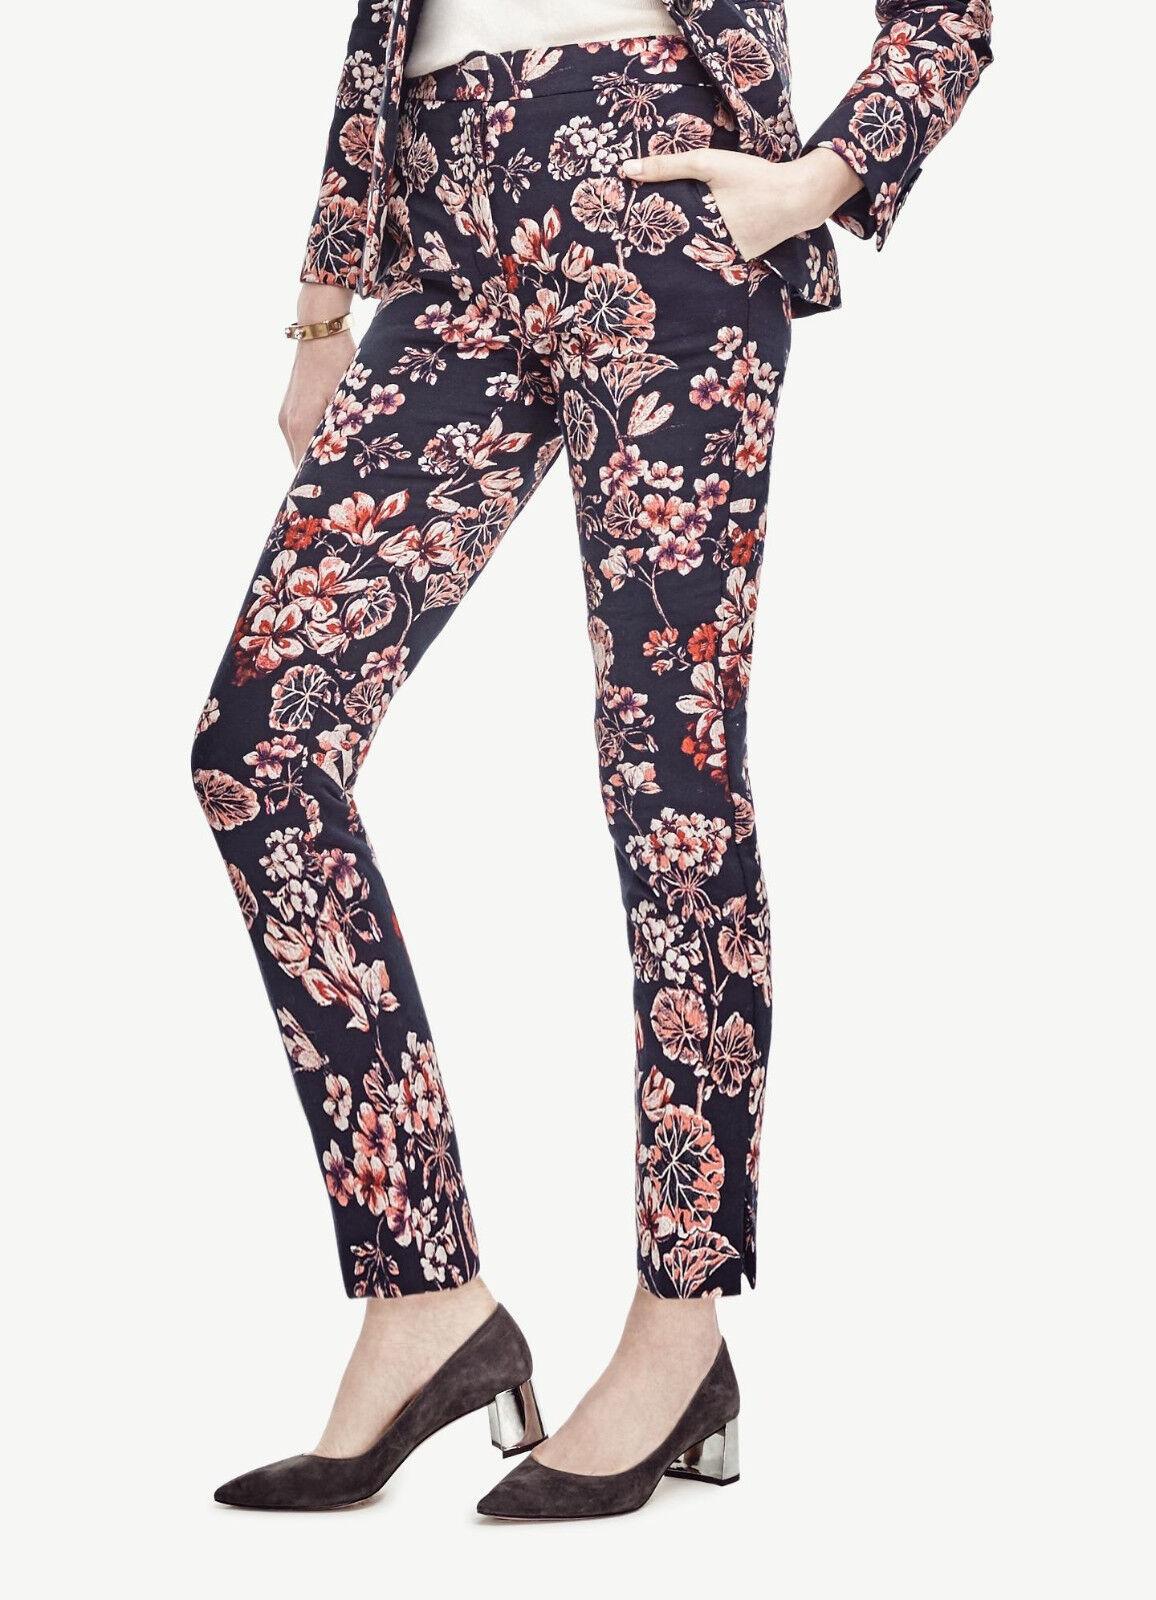 NWT Ann Taylor Jacquard Floral Print Ankle Pants Size 4